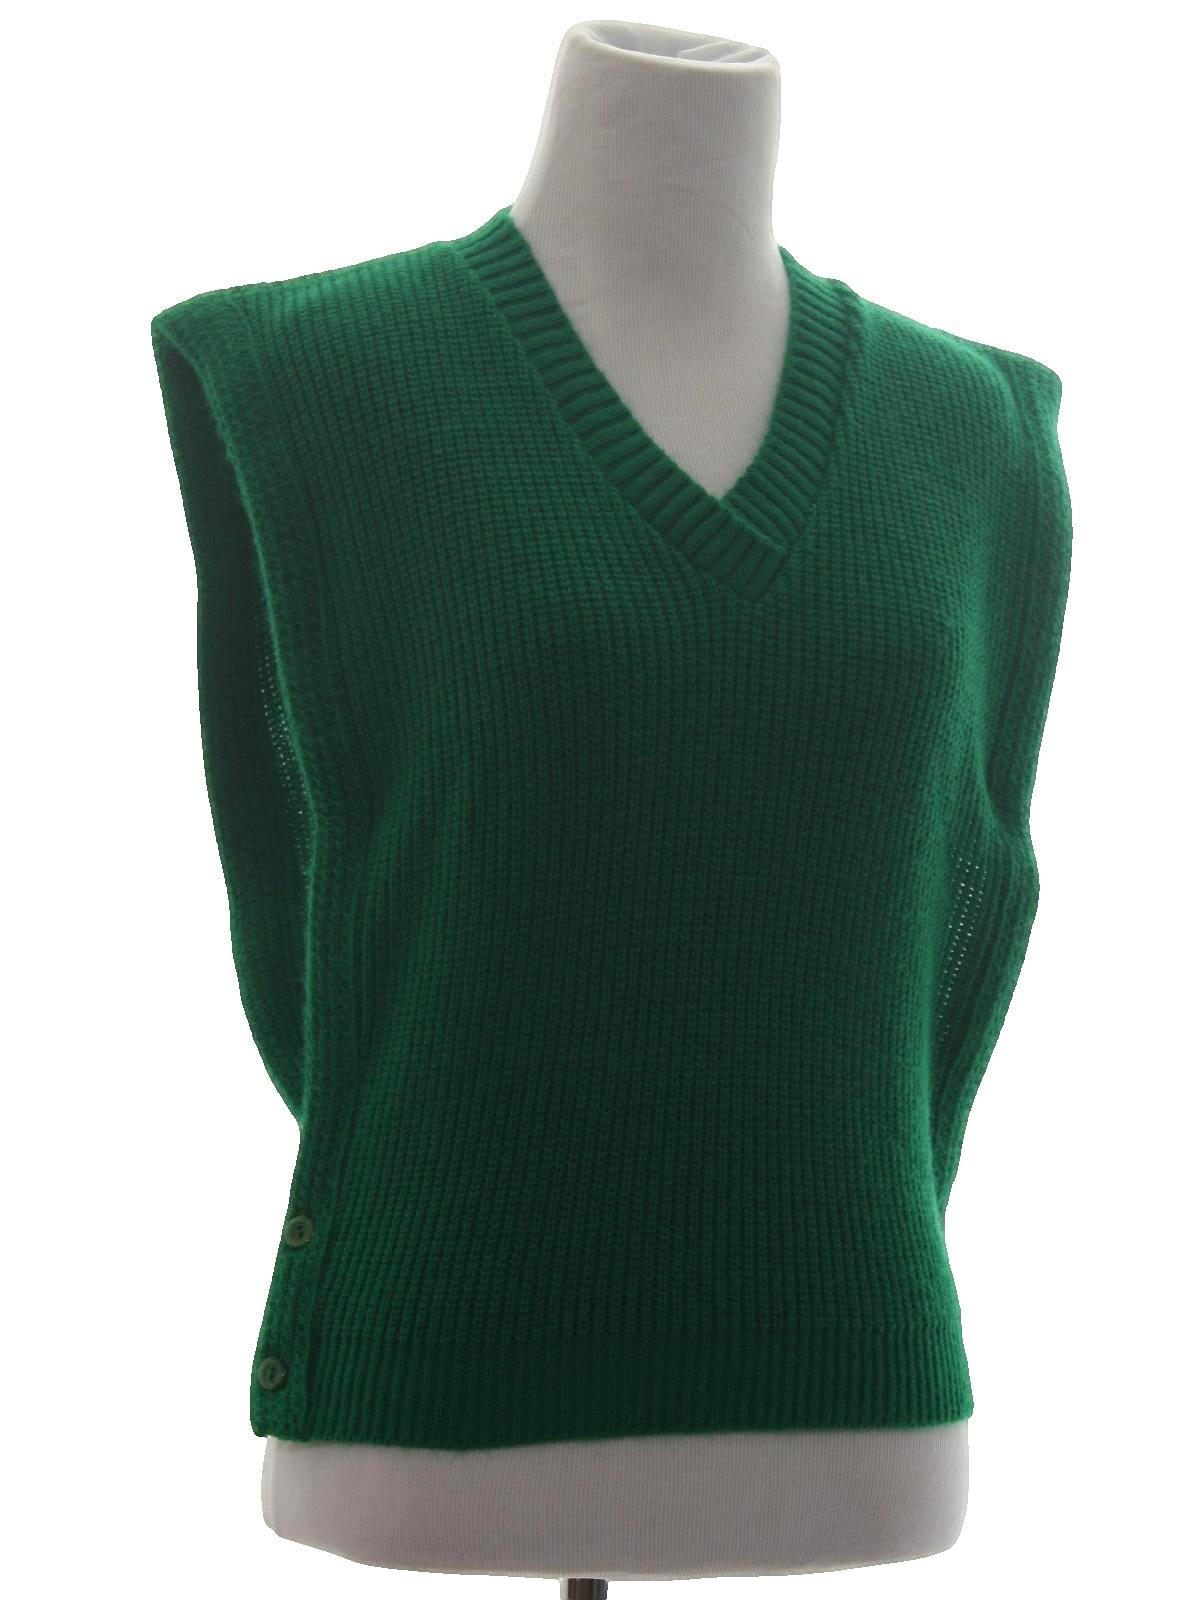 80s Retro Sweater 80s Hunters Glen Womens Grass Green Acrylic